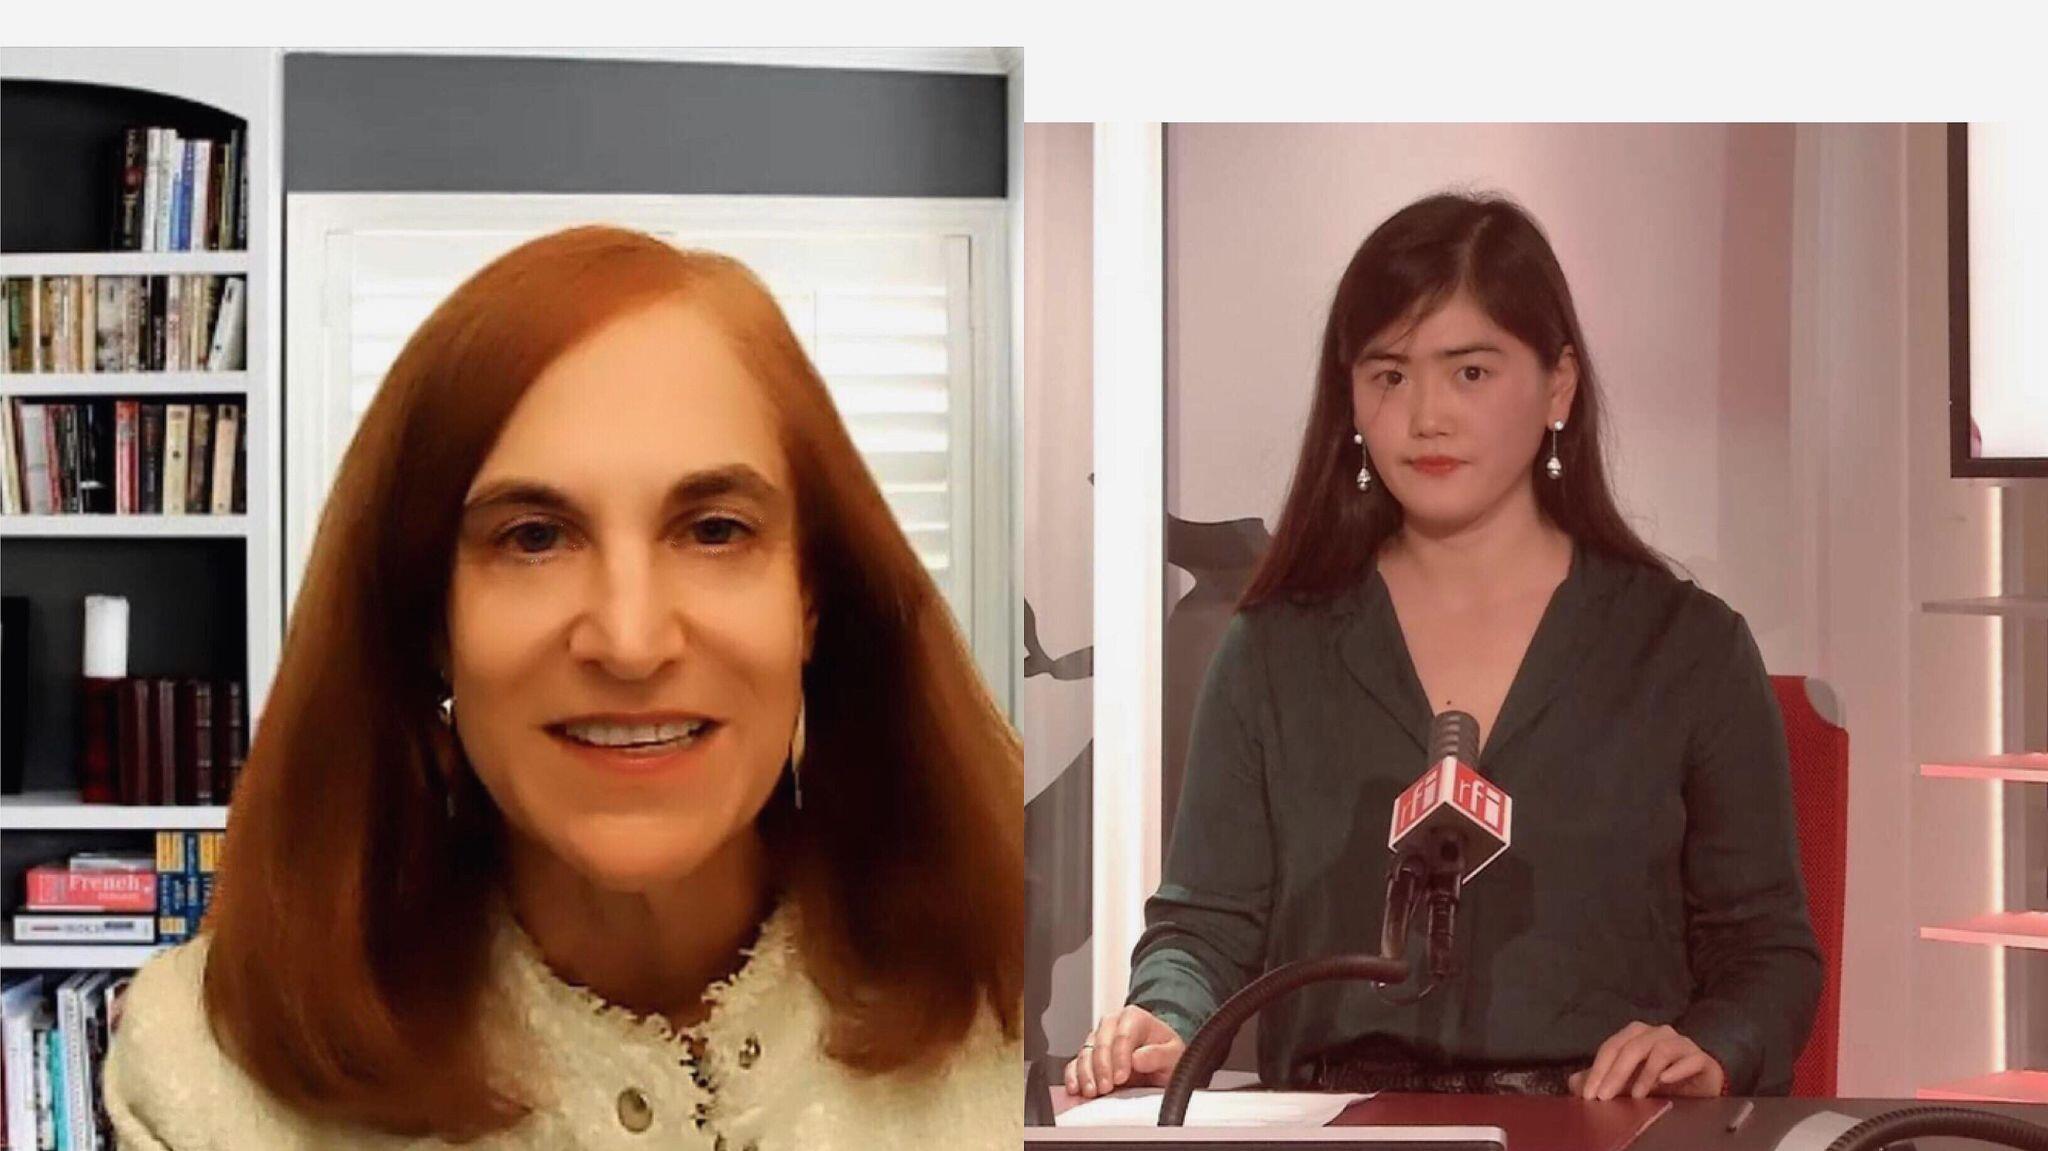 CSIS(戰略與國際研究中心)高級研究員Bonnie Glaser接受採訪